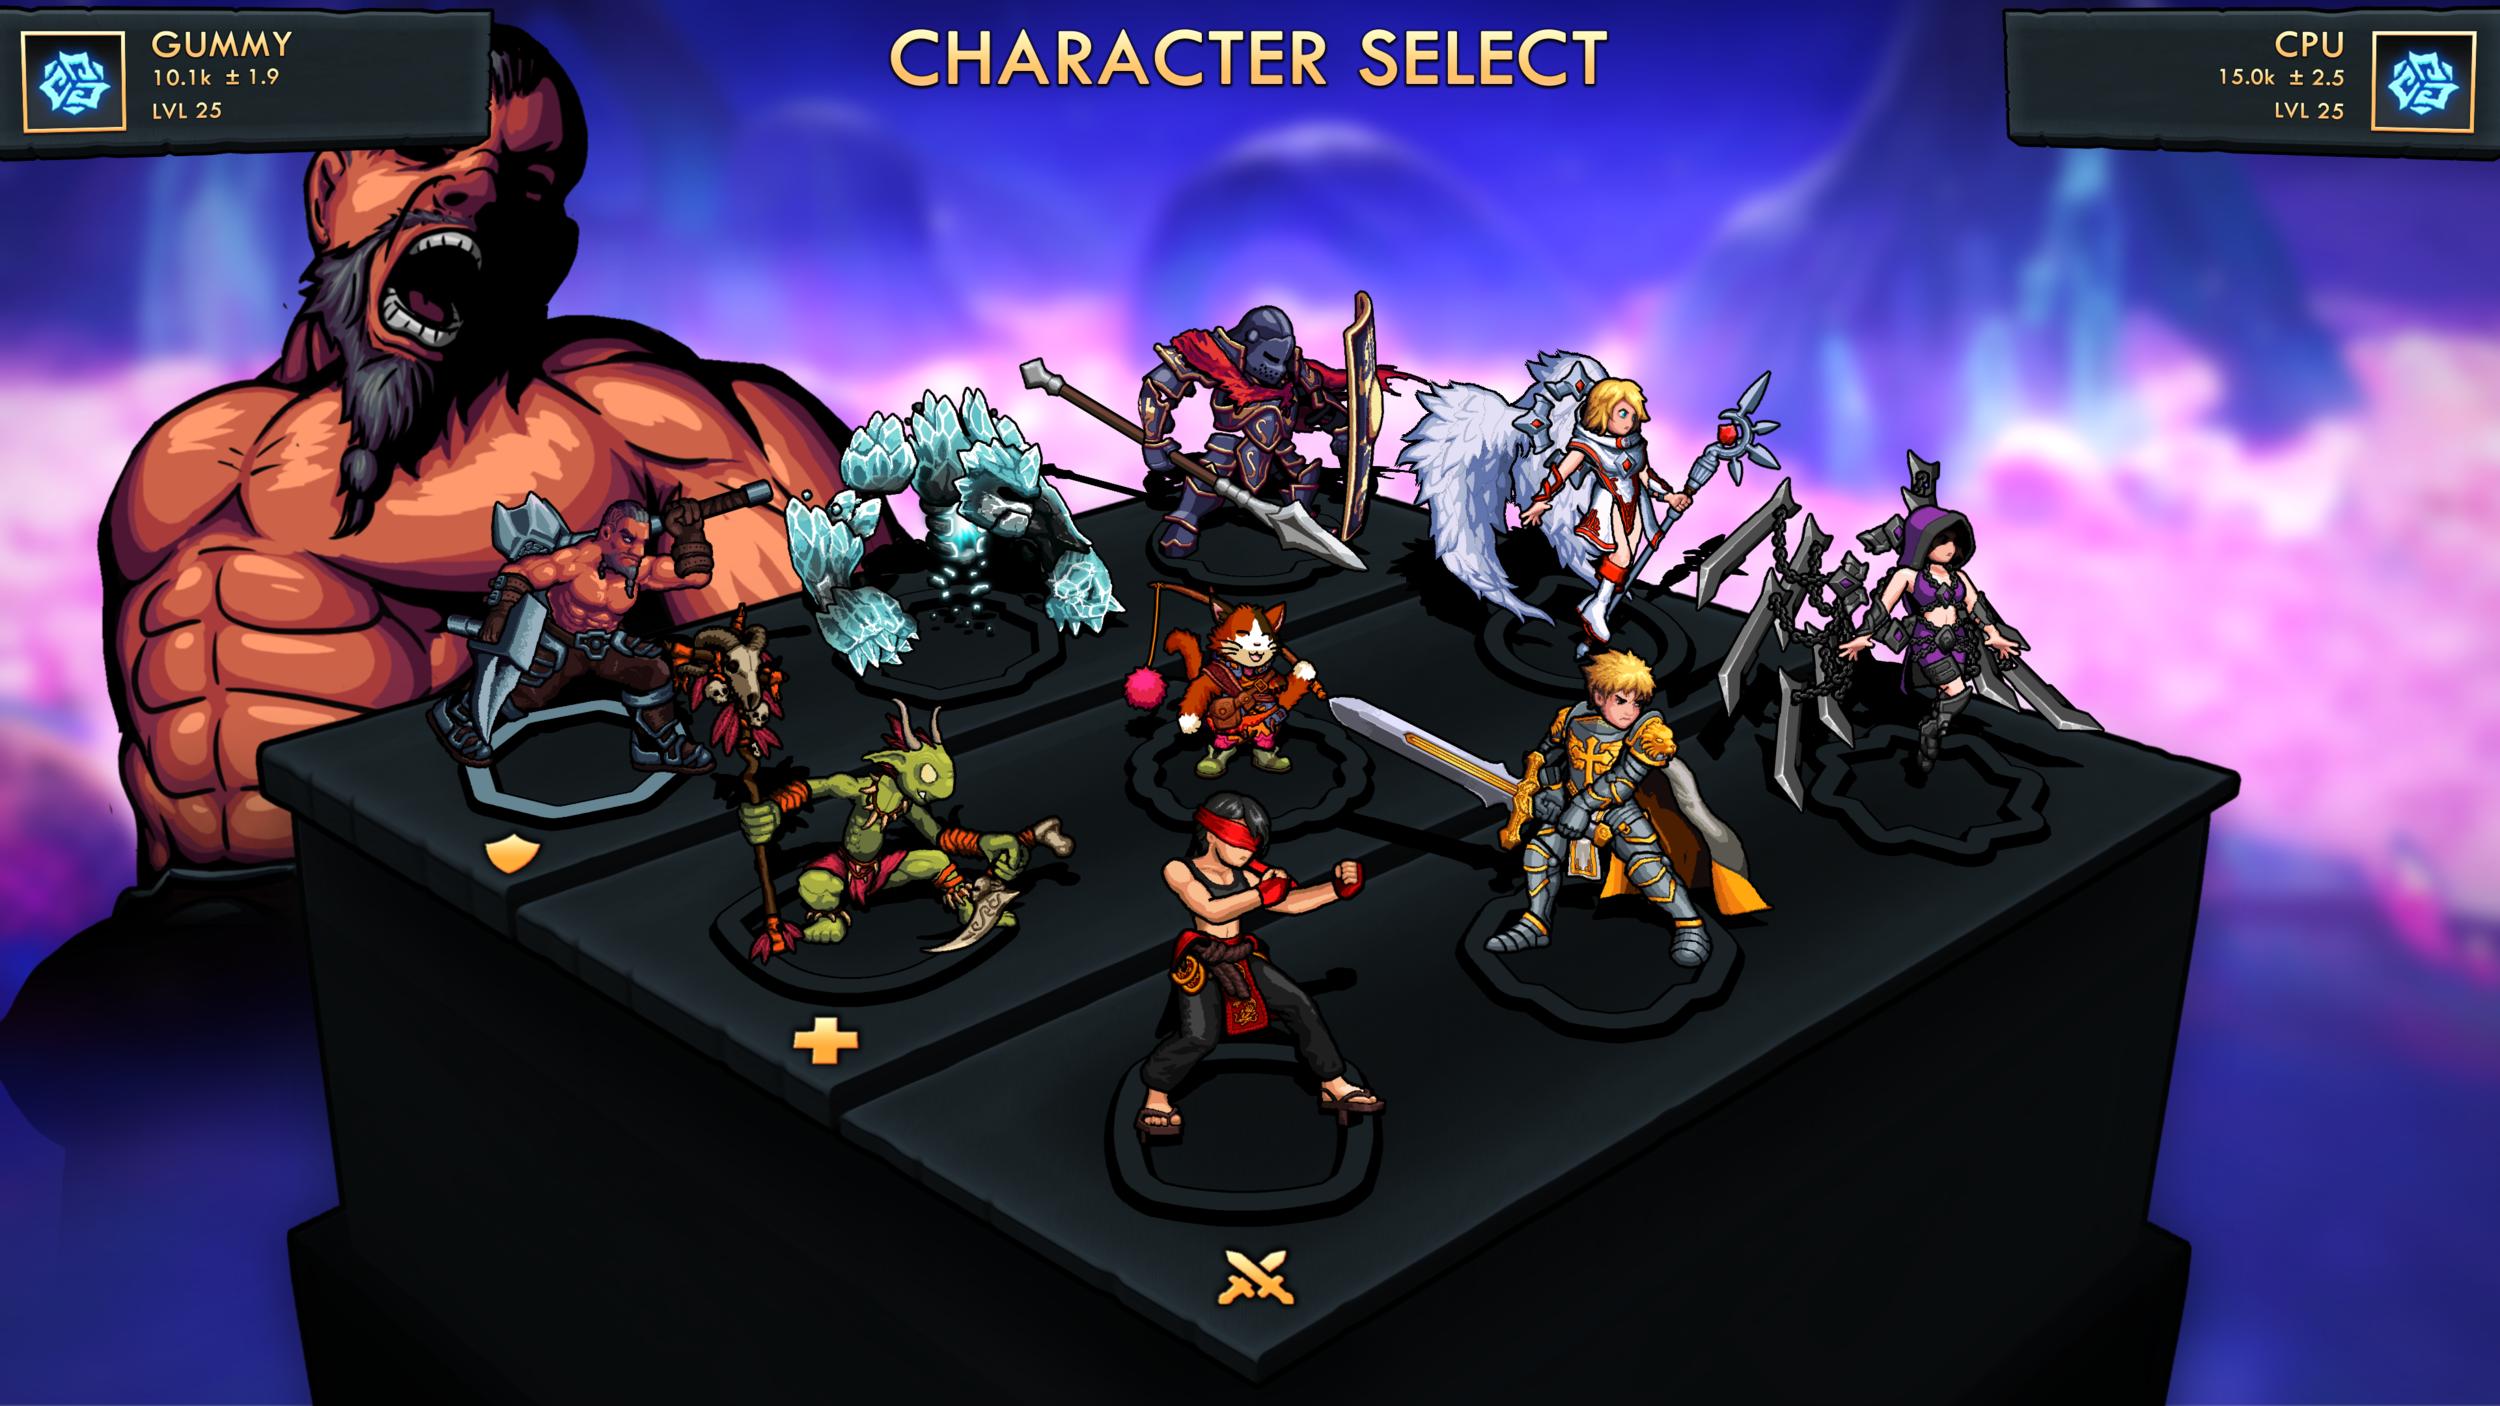 Character Select Hotsaucebread.png